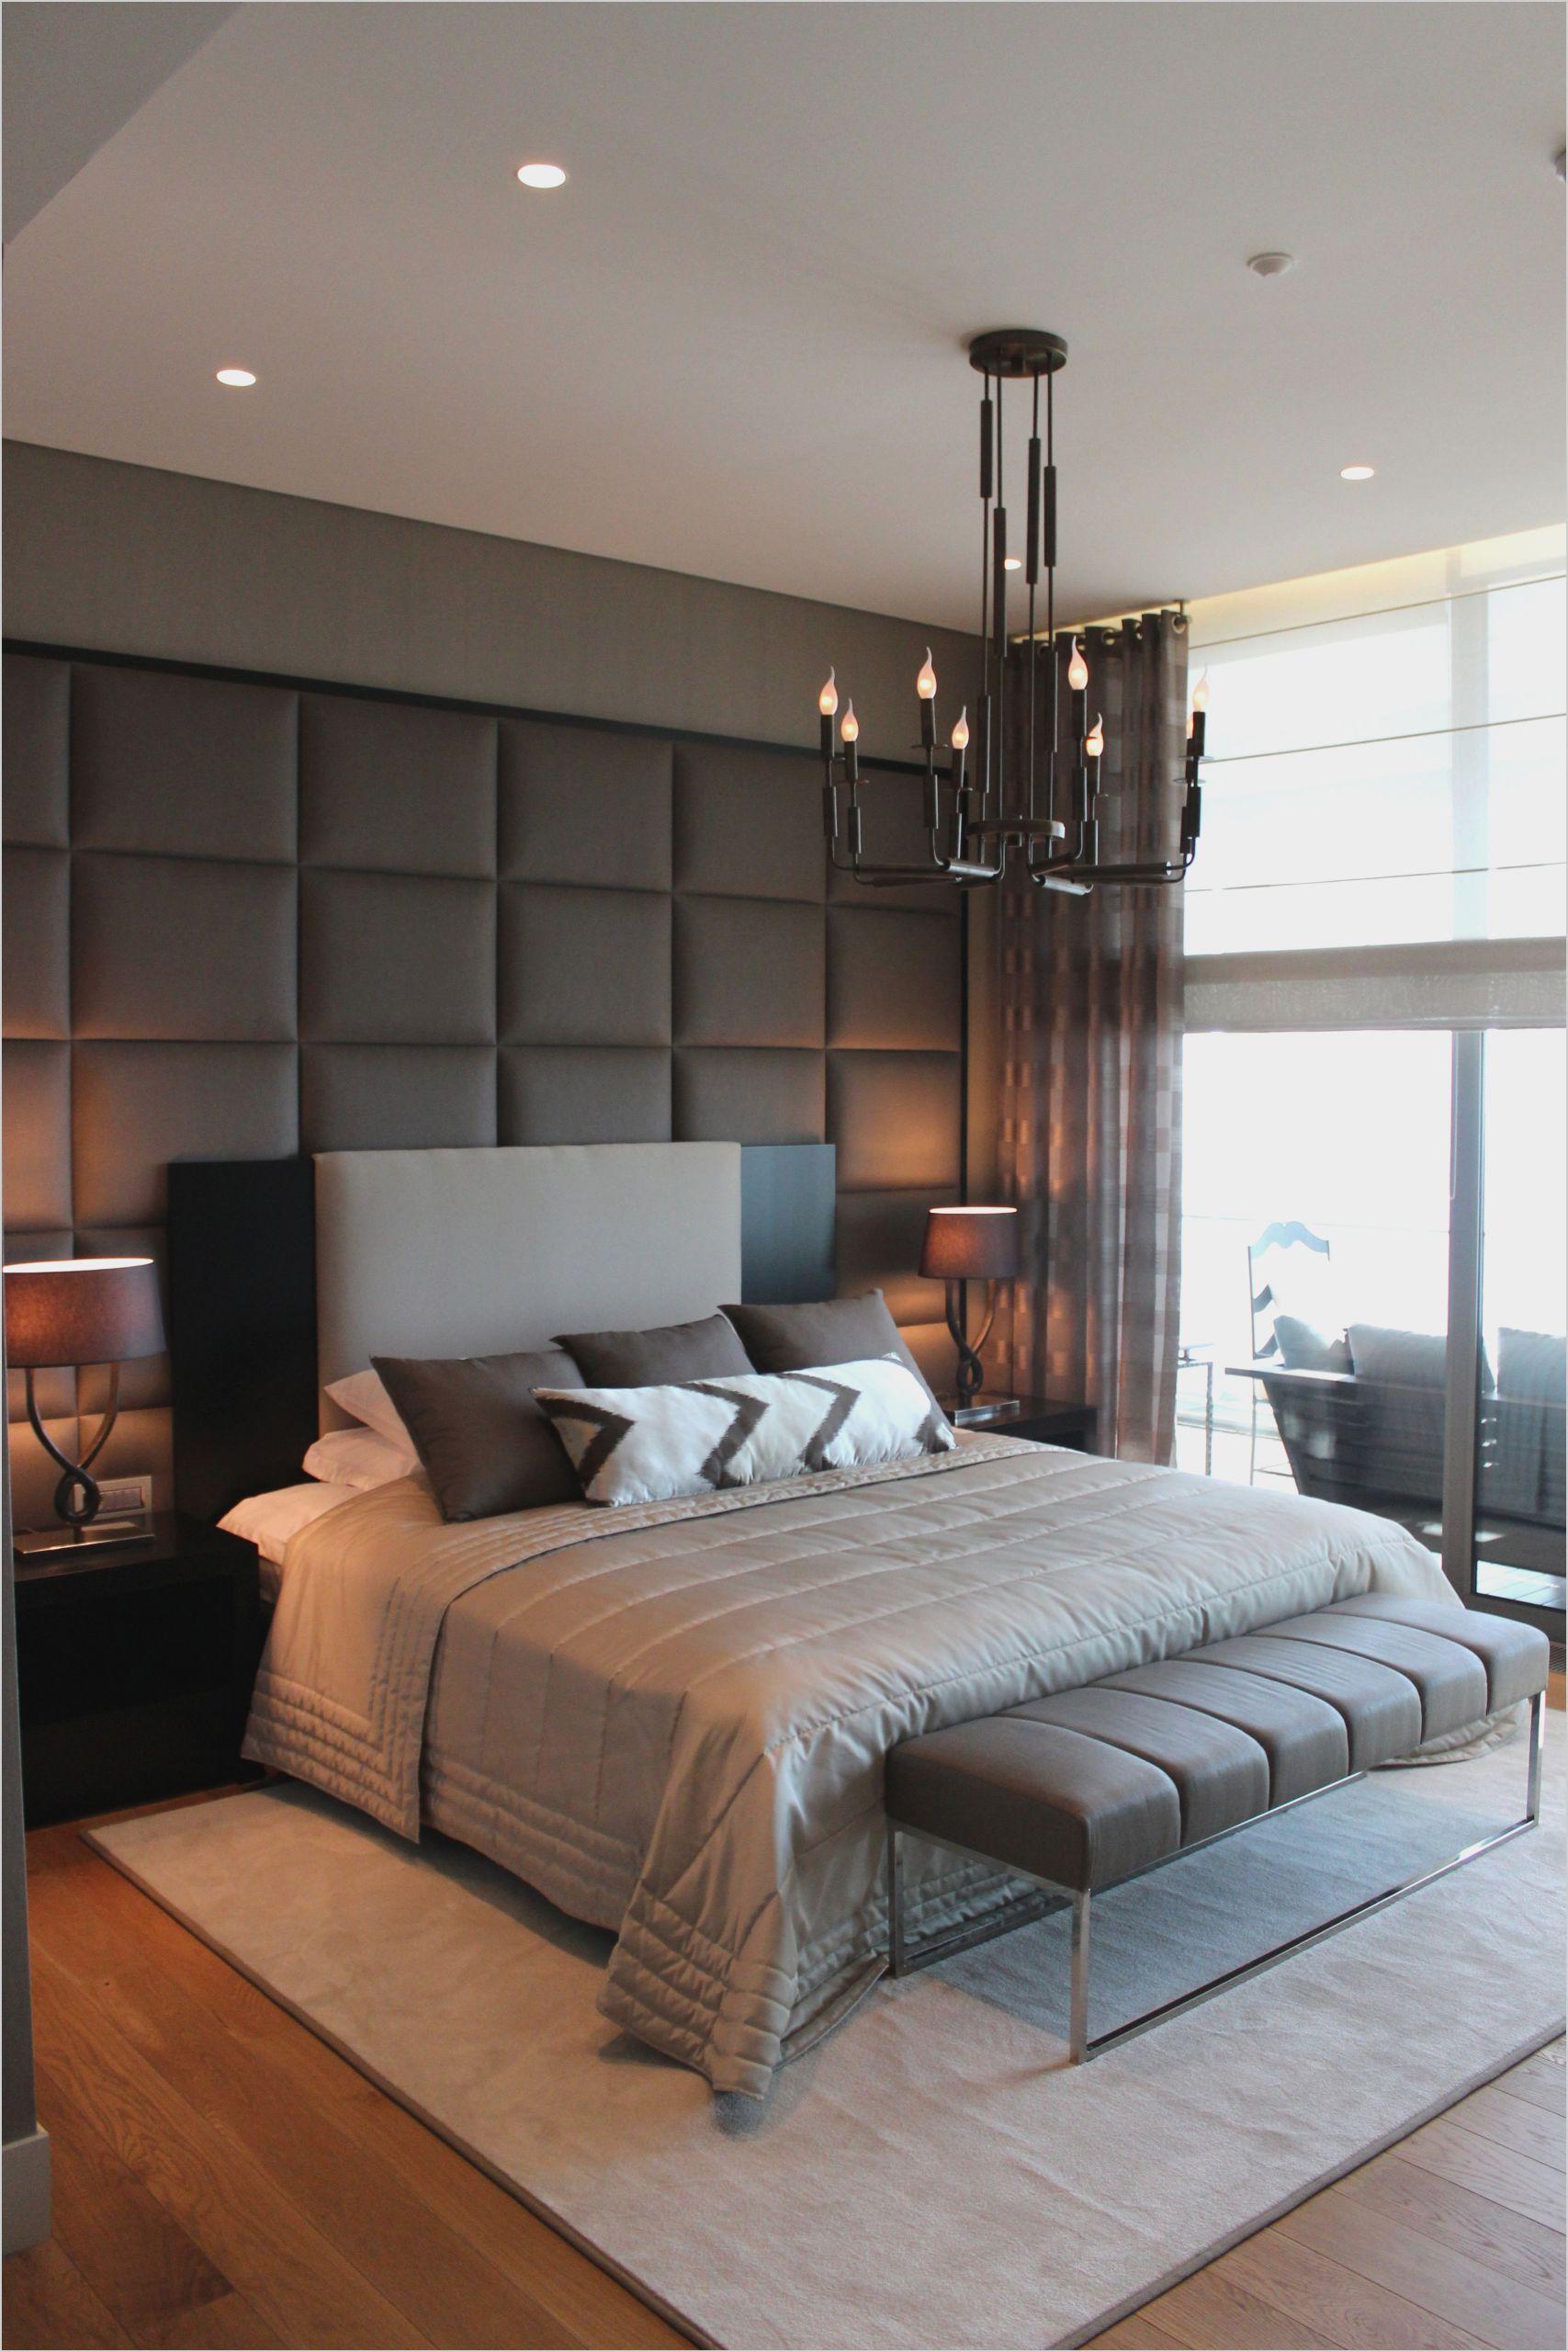 20 Luxurious Bedroom Design Ideas To Copy Next Season Home Decor Interior Design Inspiration Luxurious Bedrooms Master Bedrooms Decor Luxury Bedroom Design